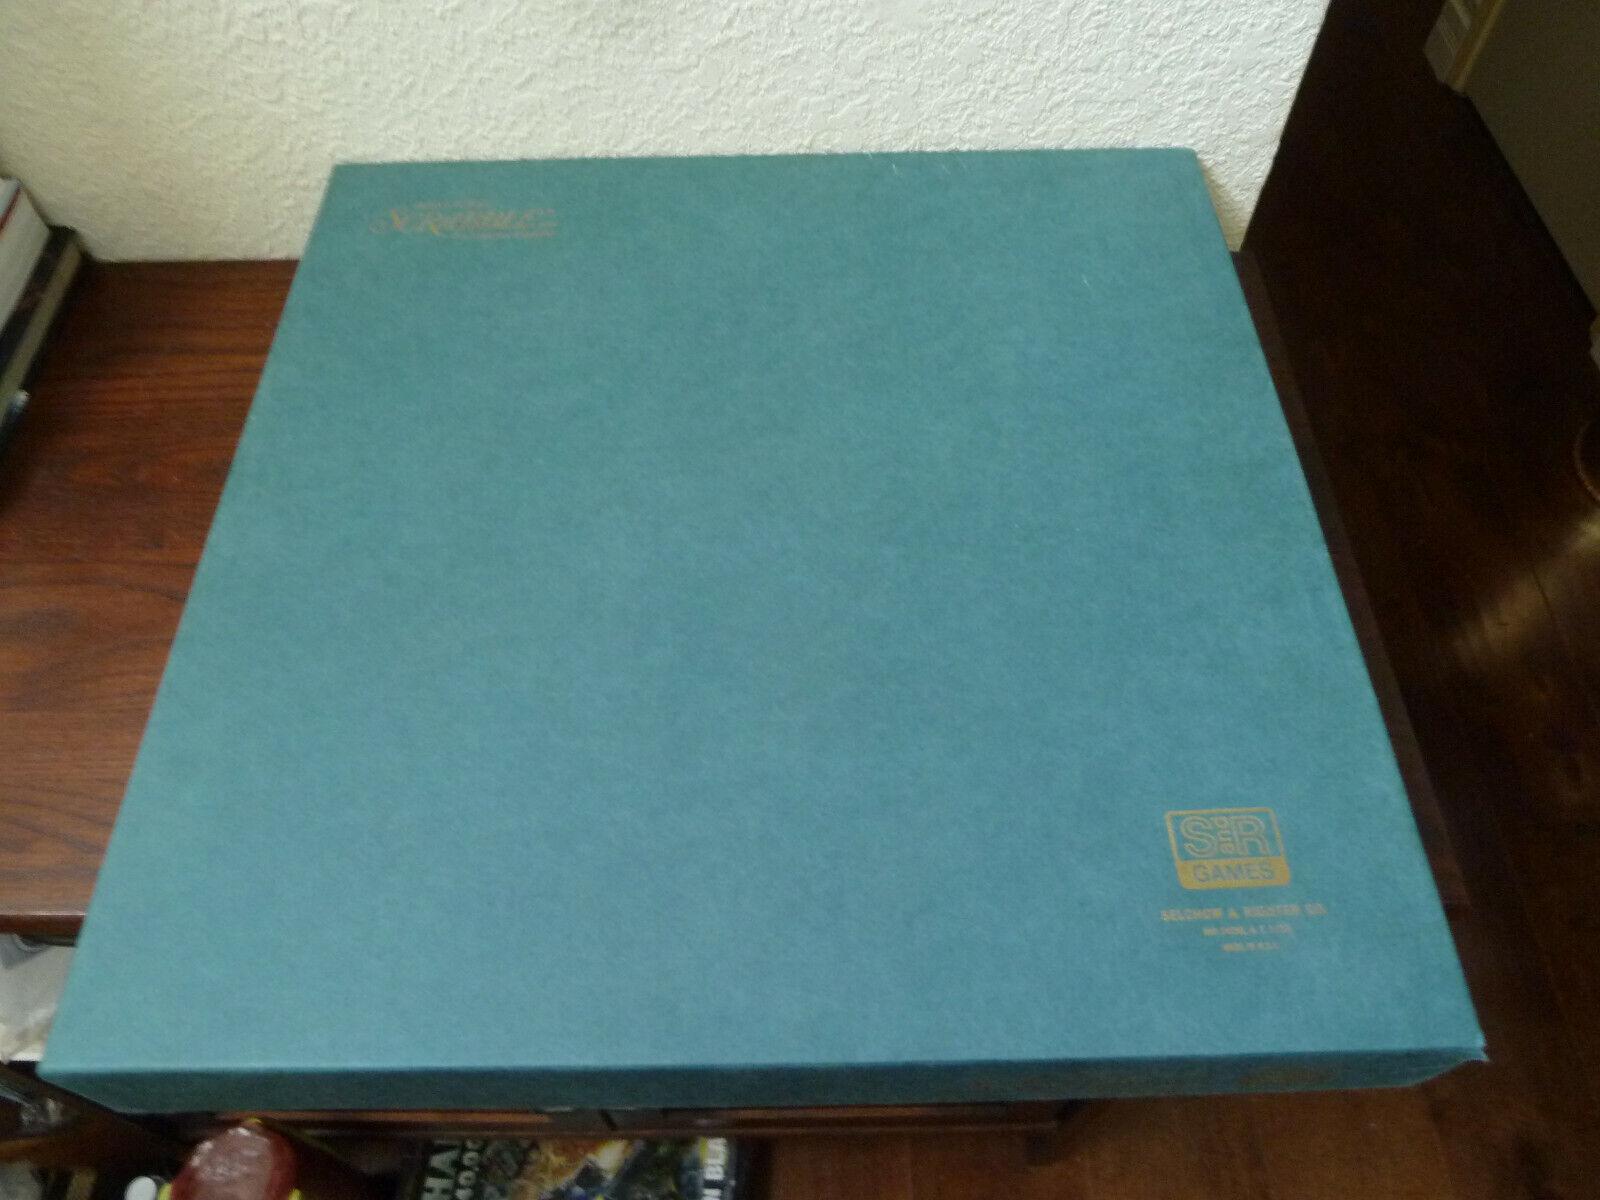 Vintage 1977 Deluxe Scrabble Game redating Turntable Maroon Tiles 100% Complete